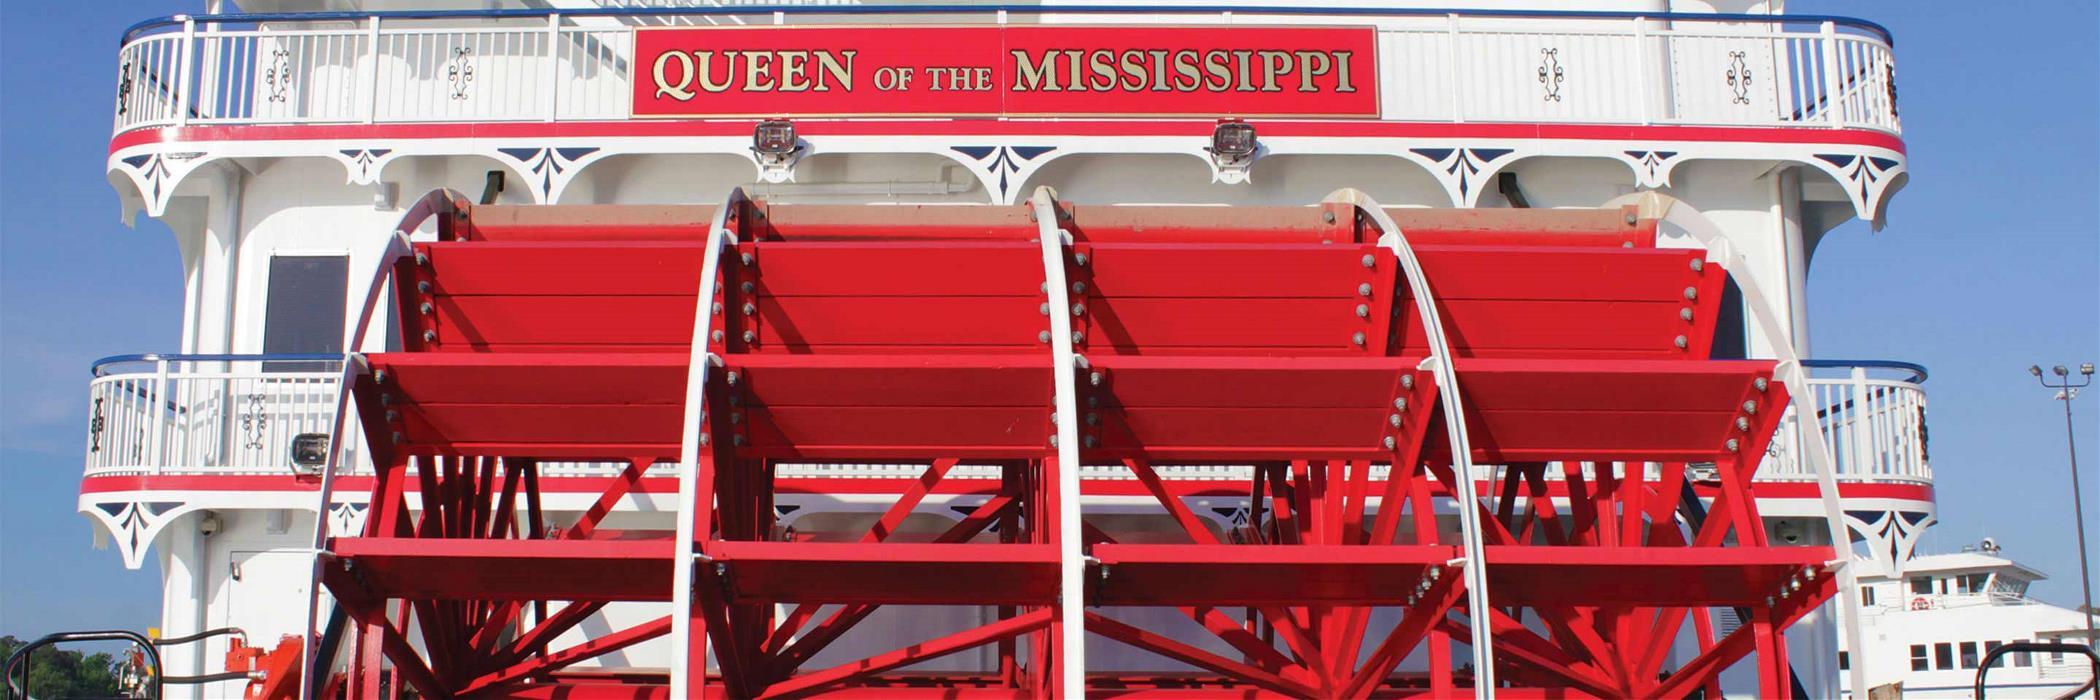 Mississippi River Cruise 2020